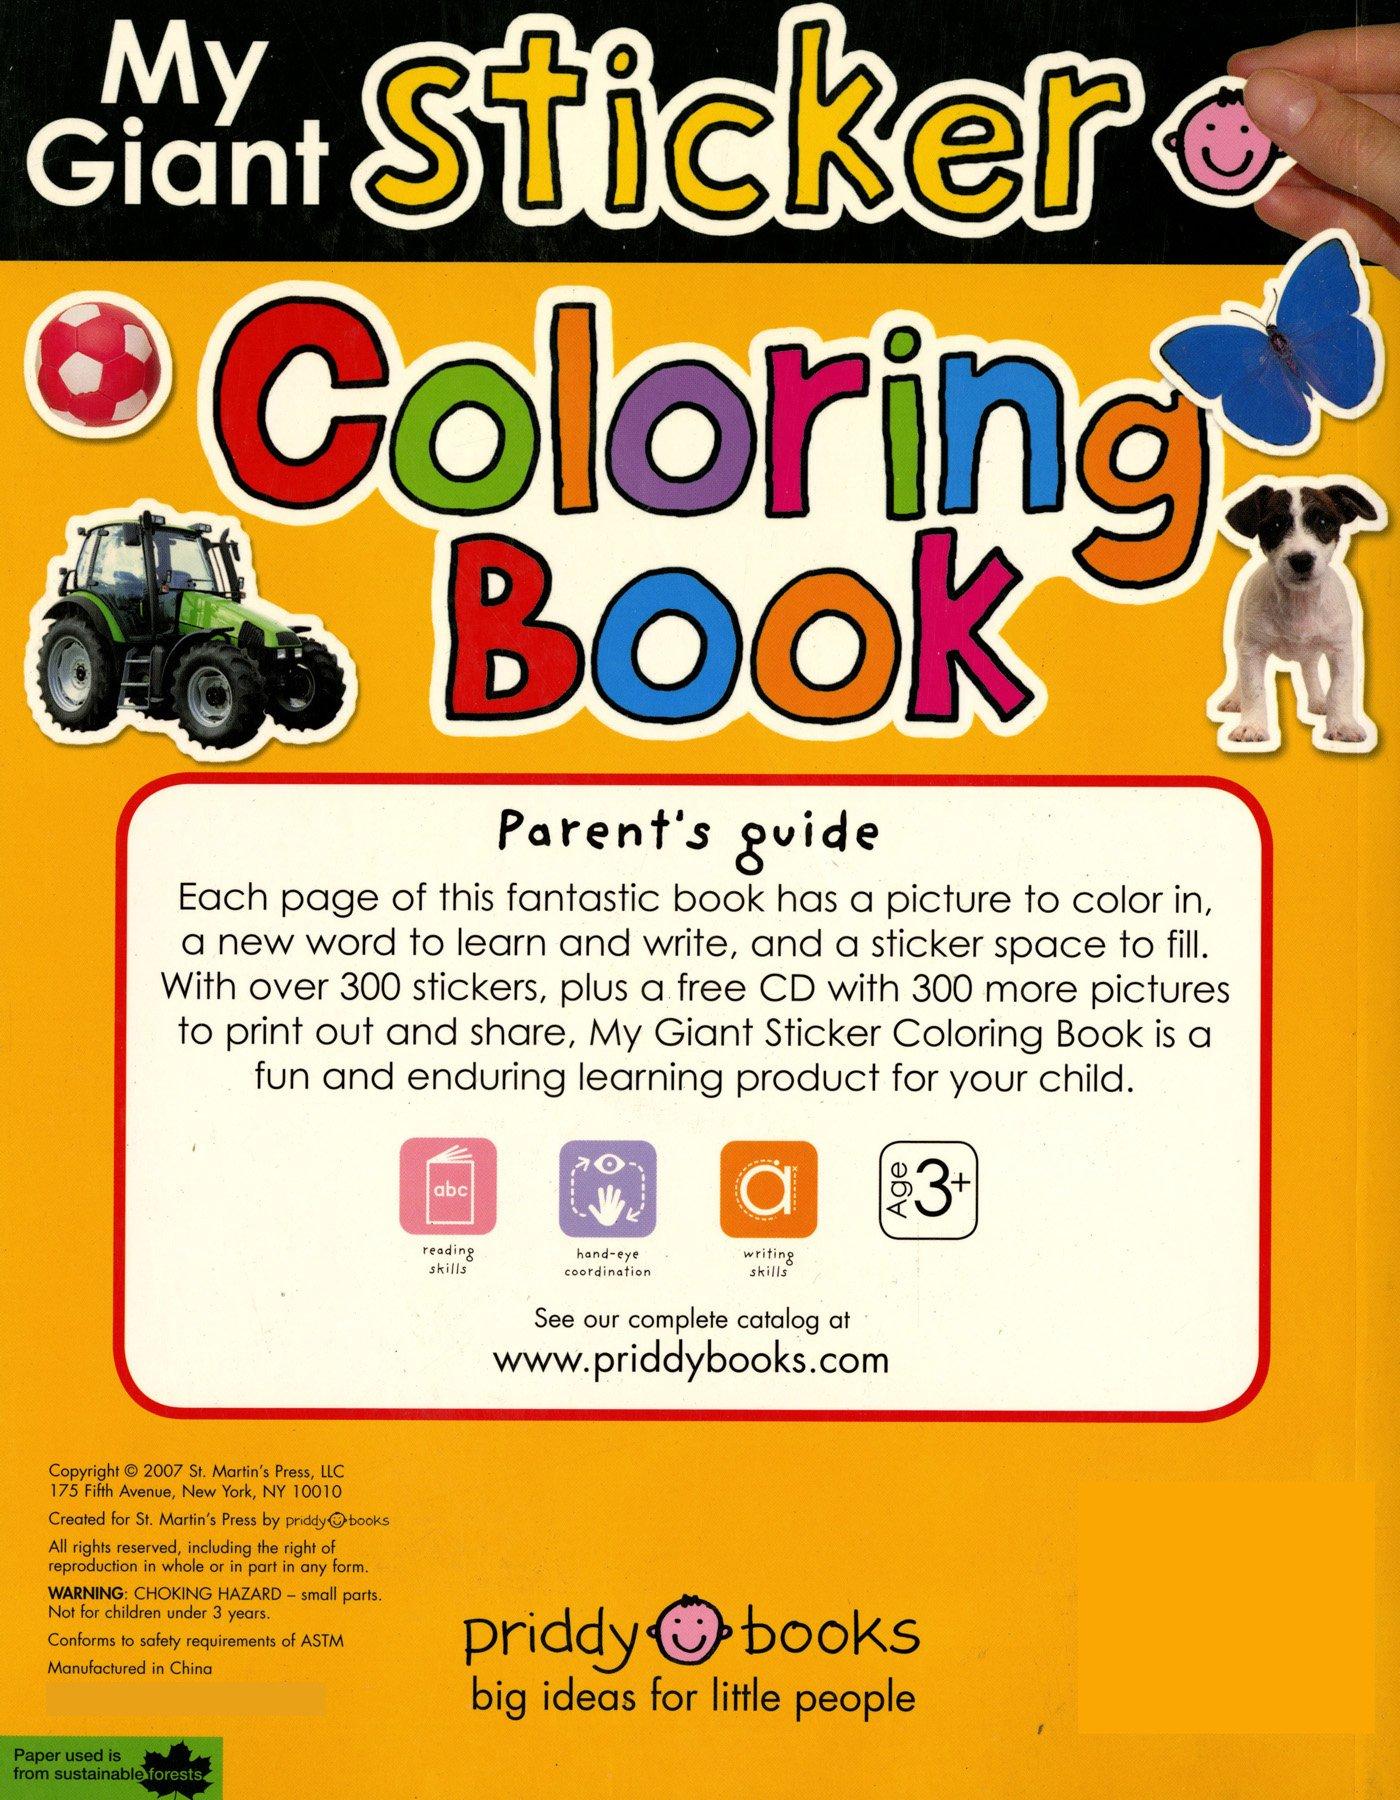 Fantastic fun book to color - My Giant Sticker Coloring Book With Cd 1 Giant Sticker Activity Roger Priddy 9780312500337 Amazon Com Books